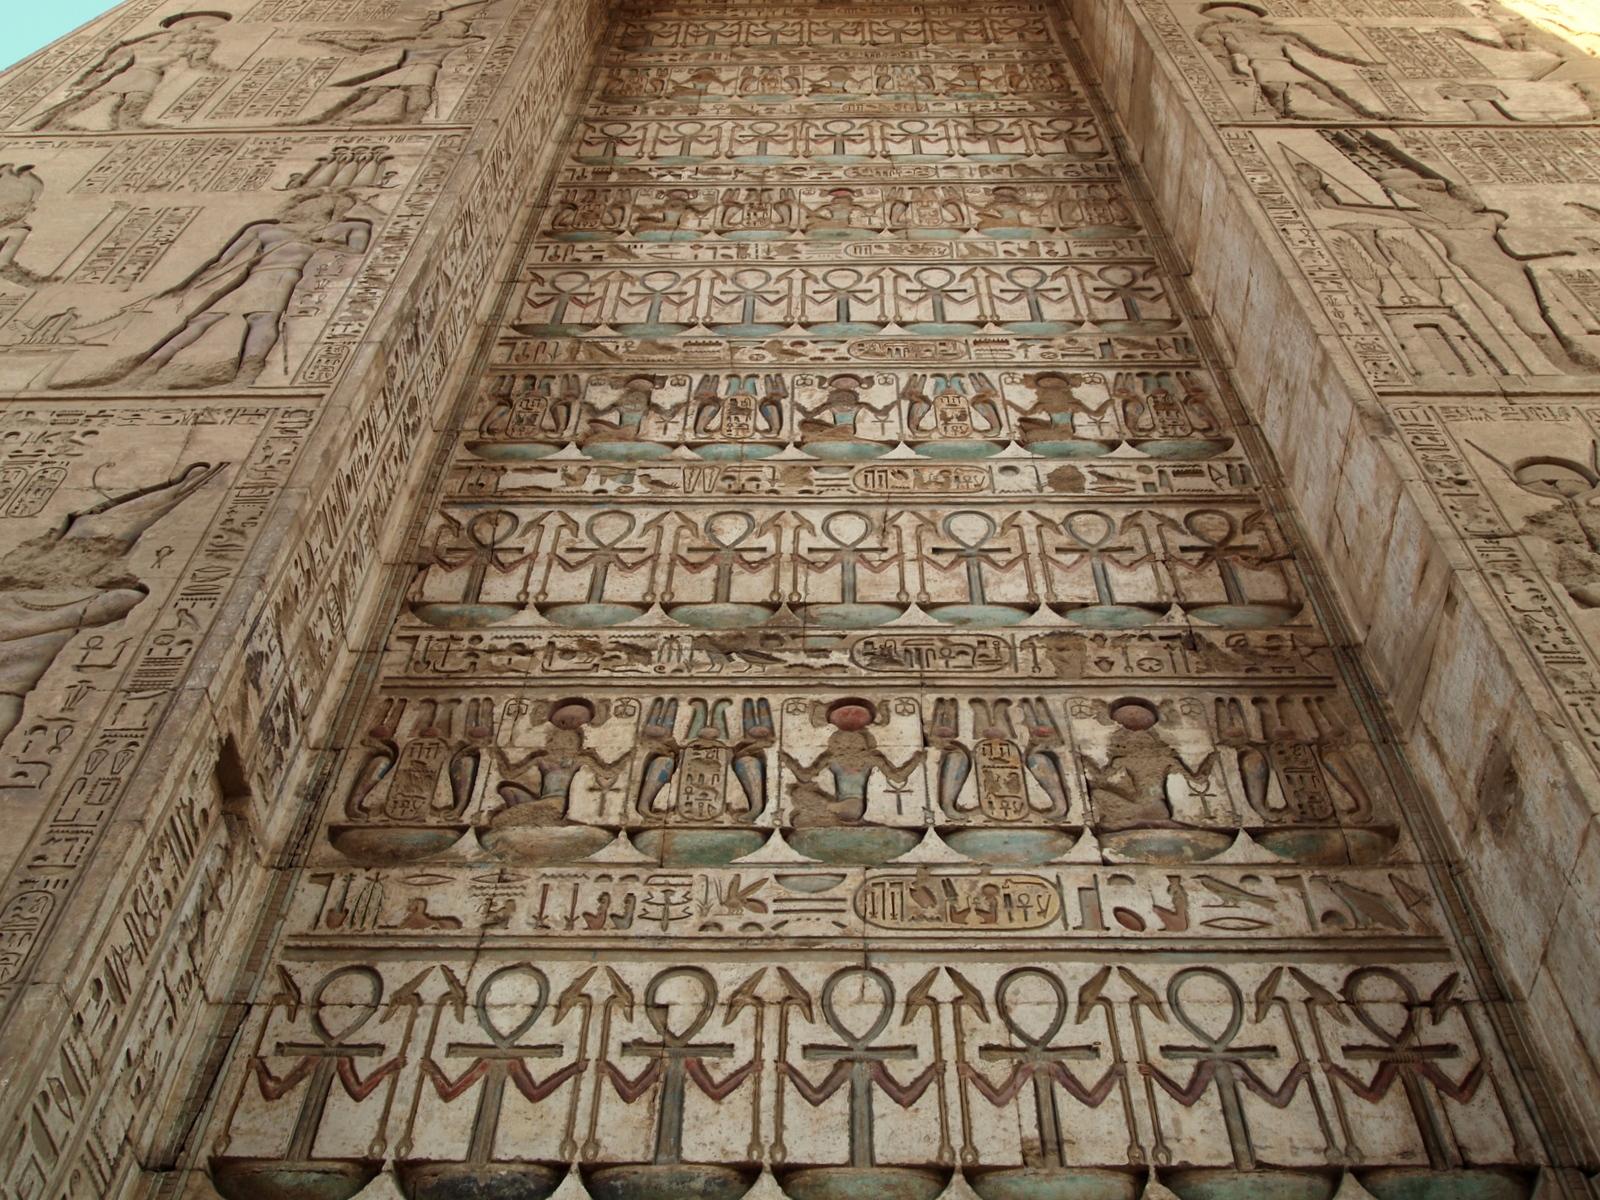 Free Computer Wallpaper Backgrounds For Fall Hd Egyptian Hieroglyphics Backgrounds Pixelstalk Net